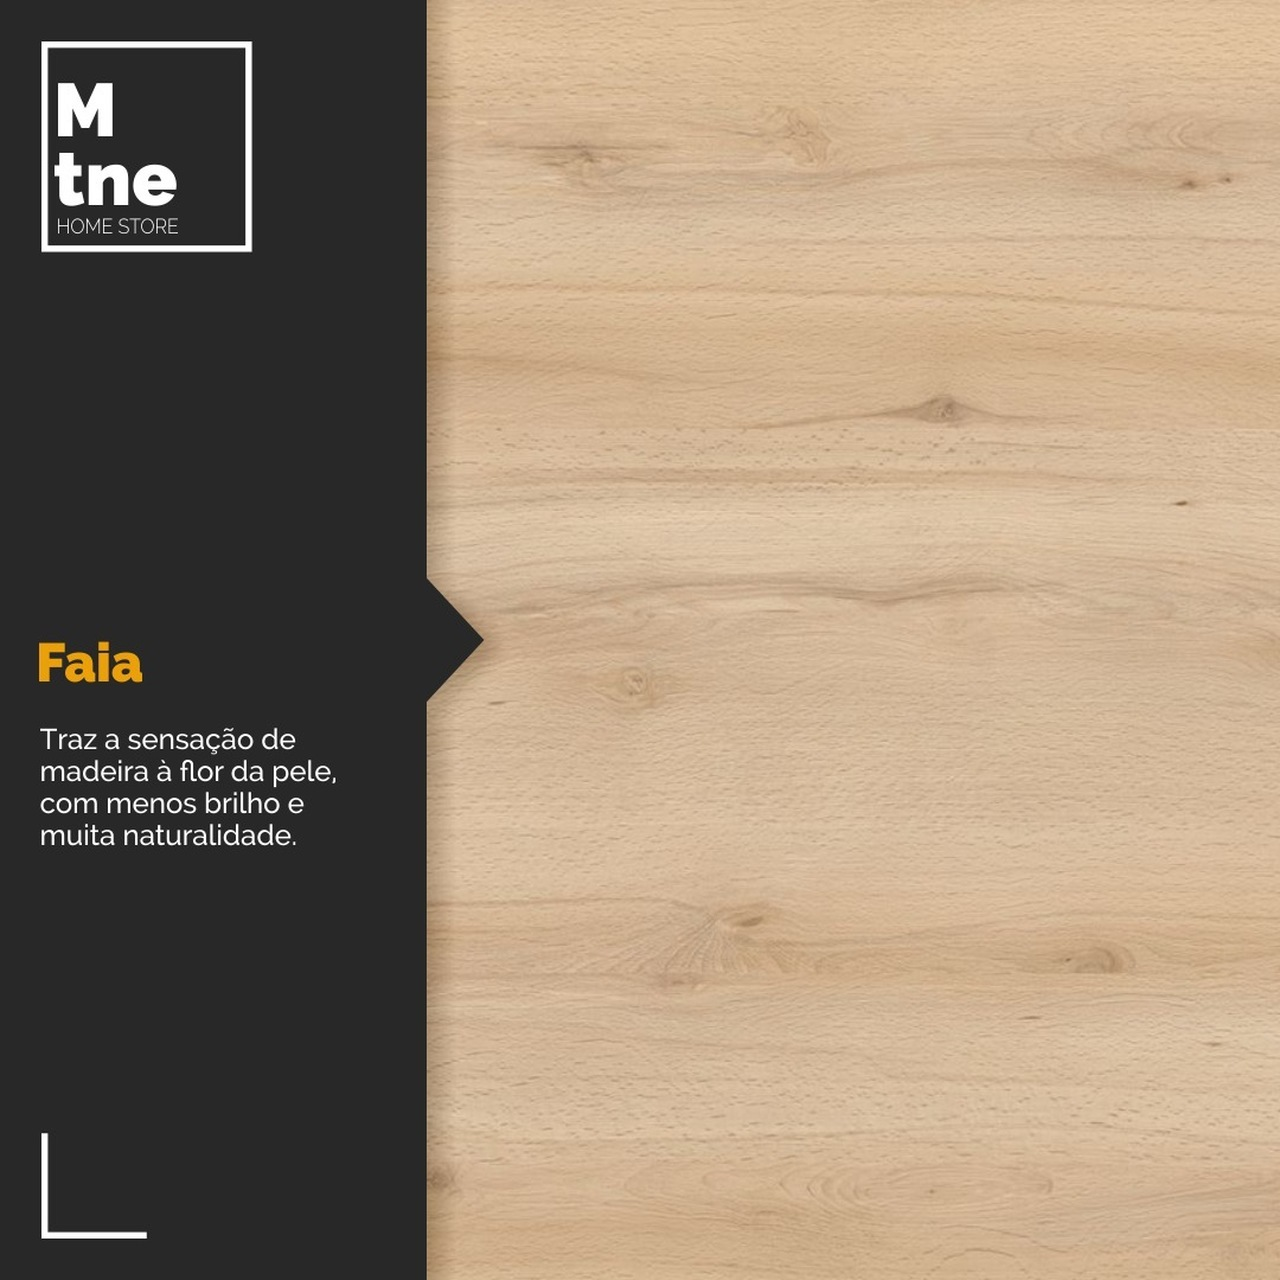 Banco Sob Medida com Hairpin Legs e Tampo 100% MDF  - Mtne Store